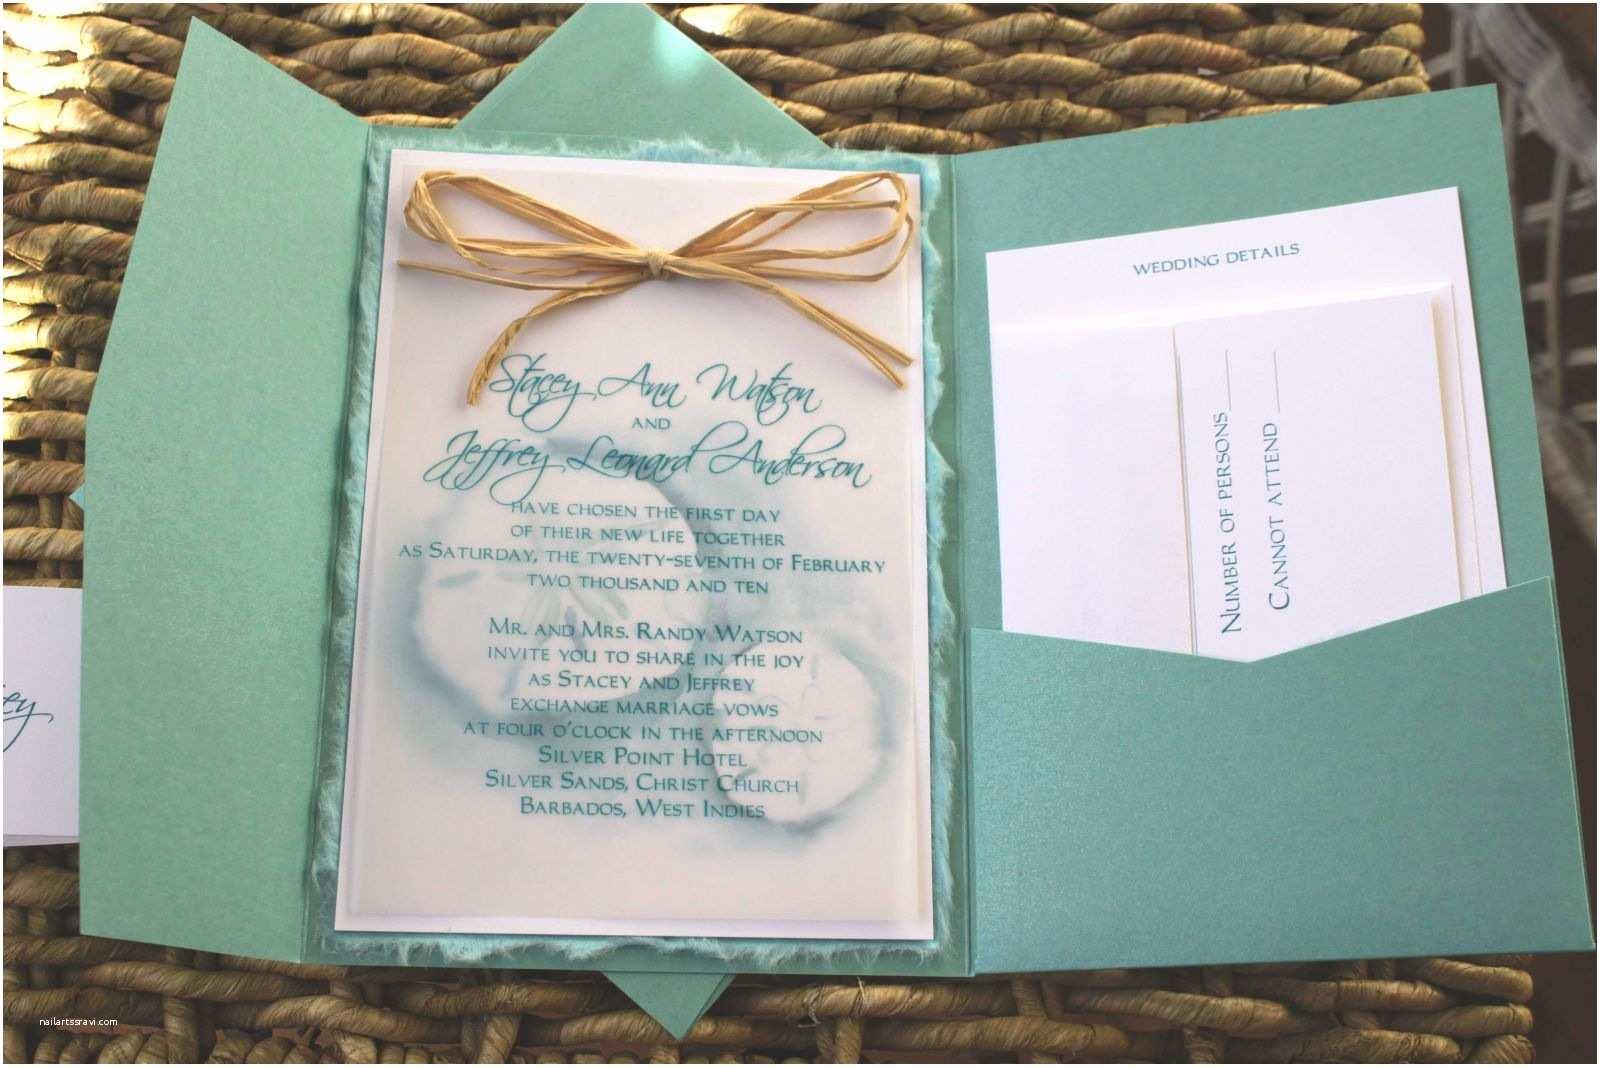 Amazon Wedding Invitations New Wedding Invitations Amazon